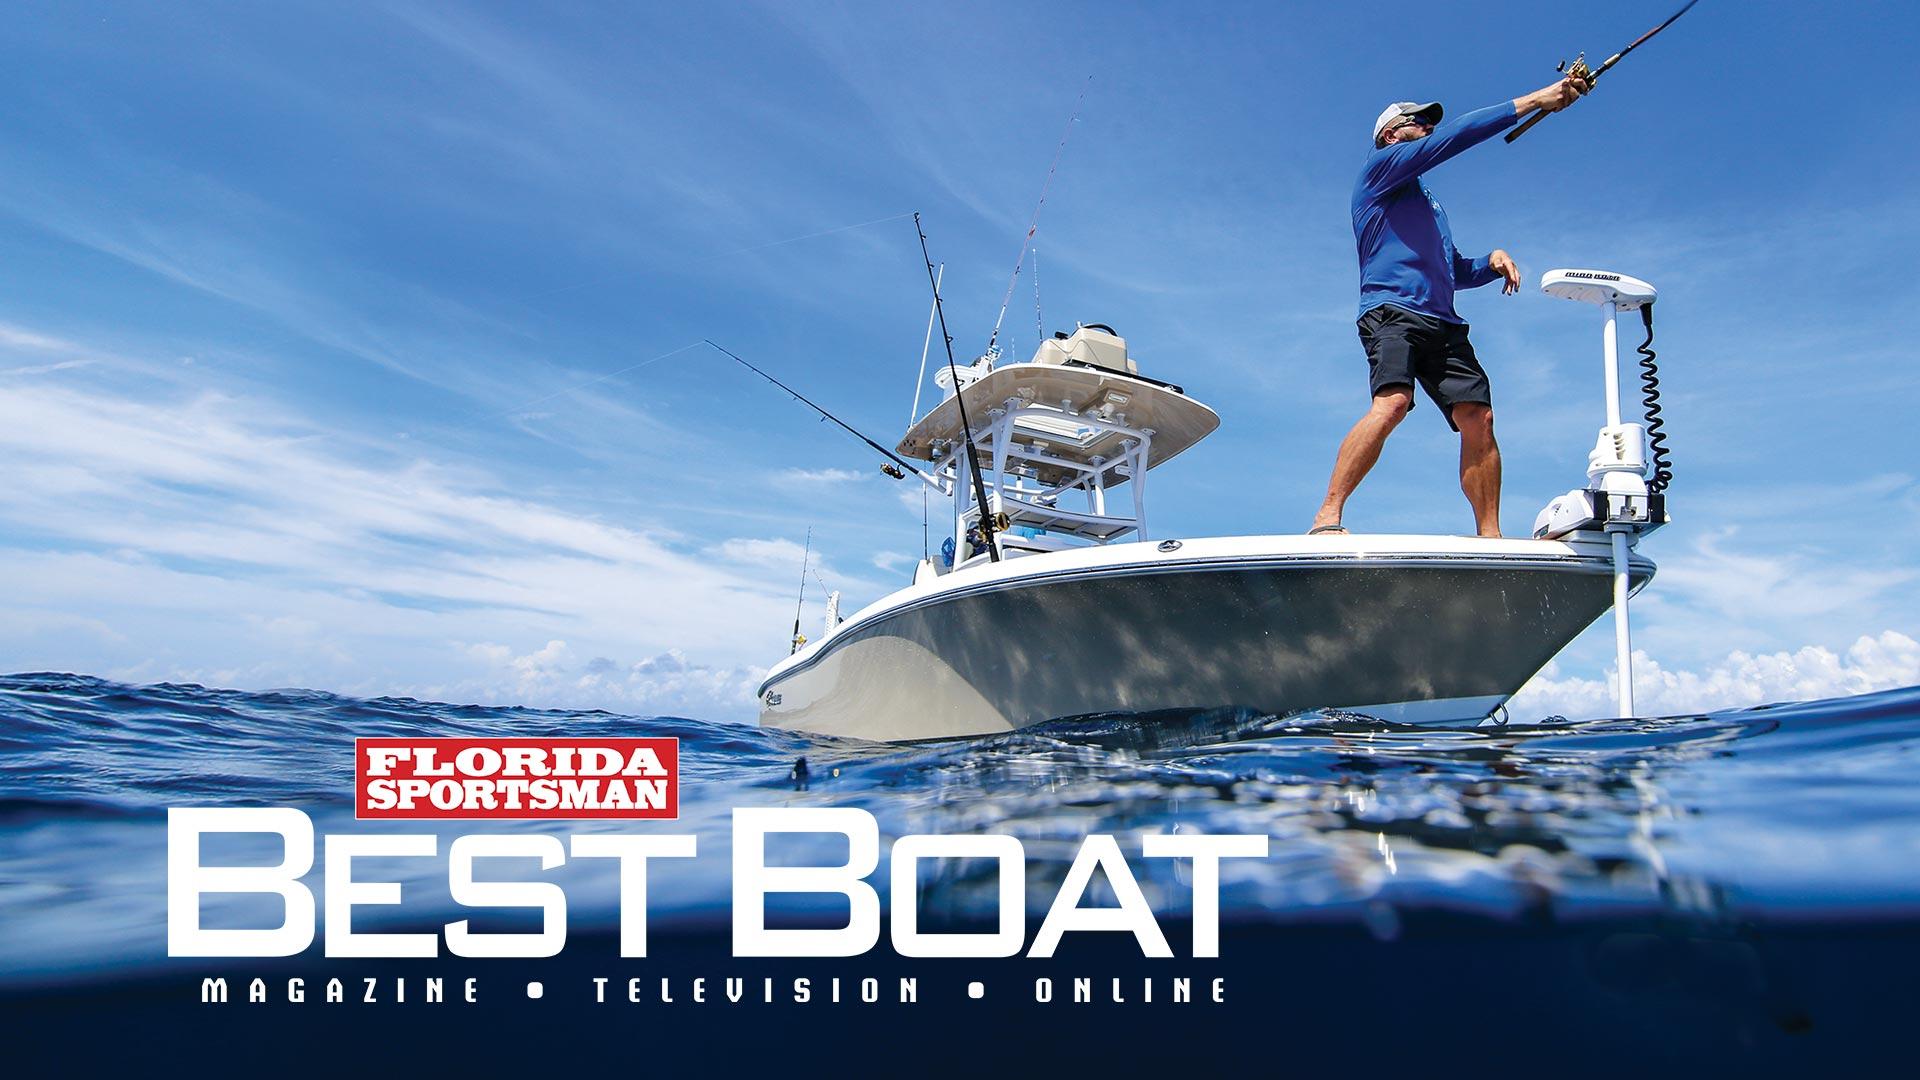 Florida Sportsman Best Boat